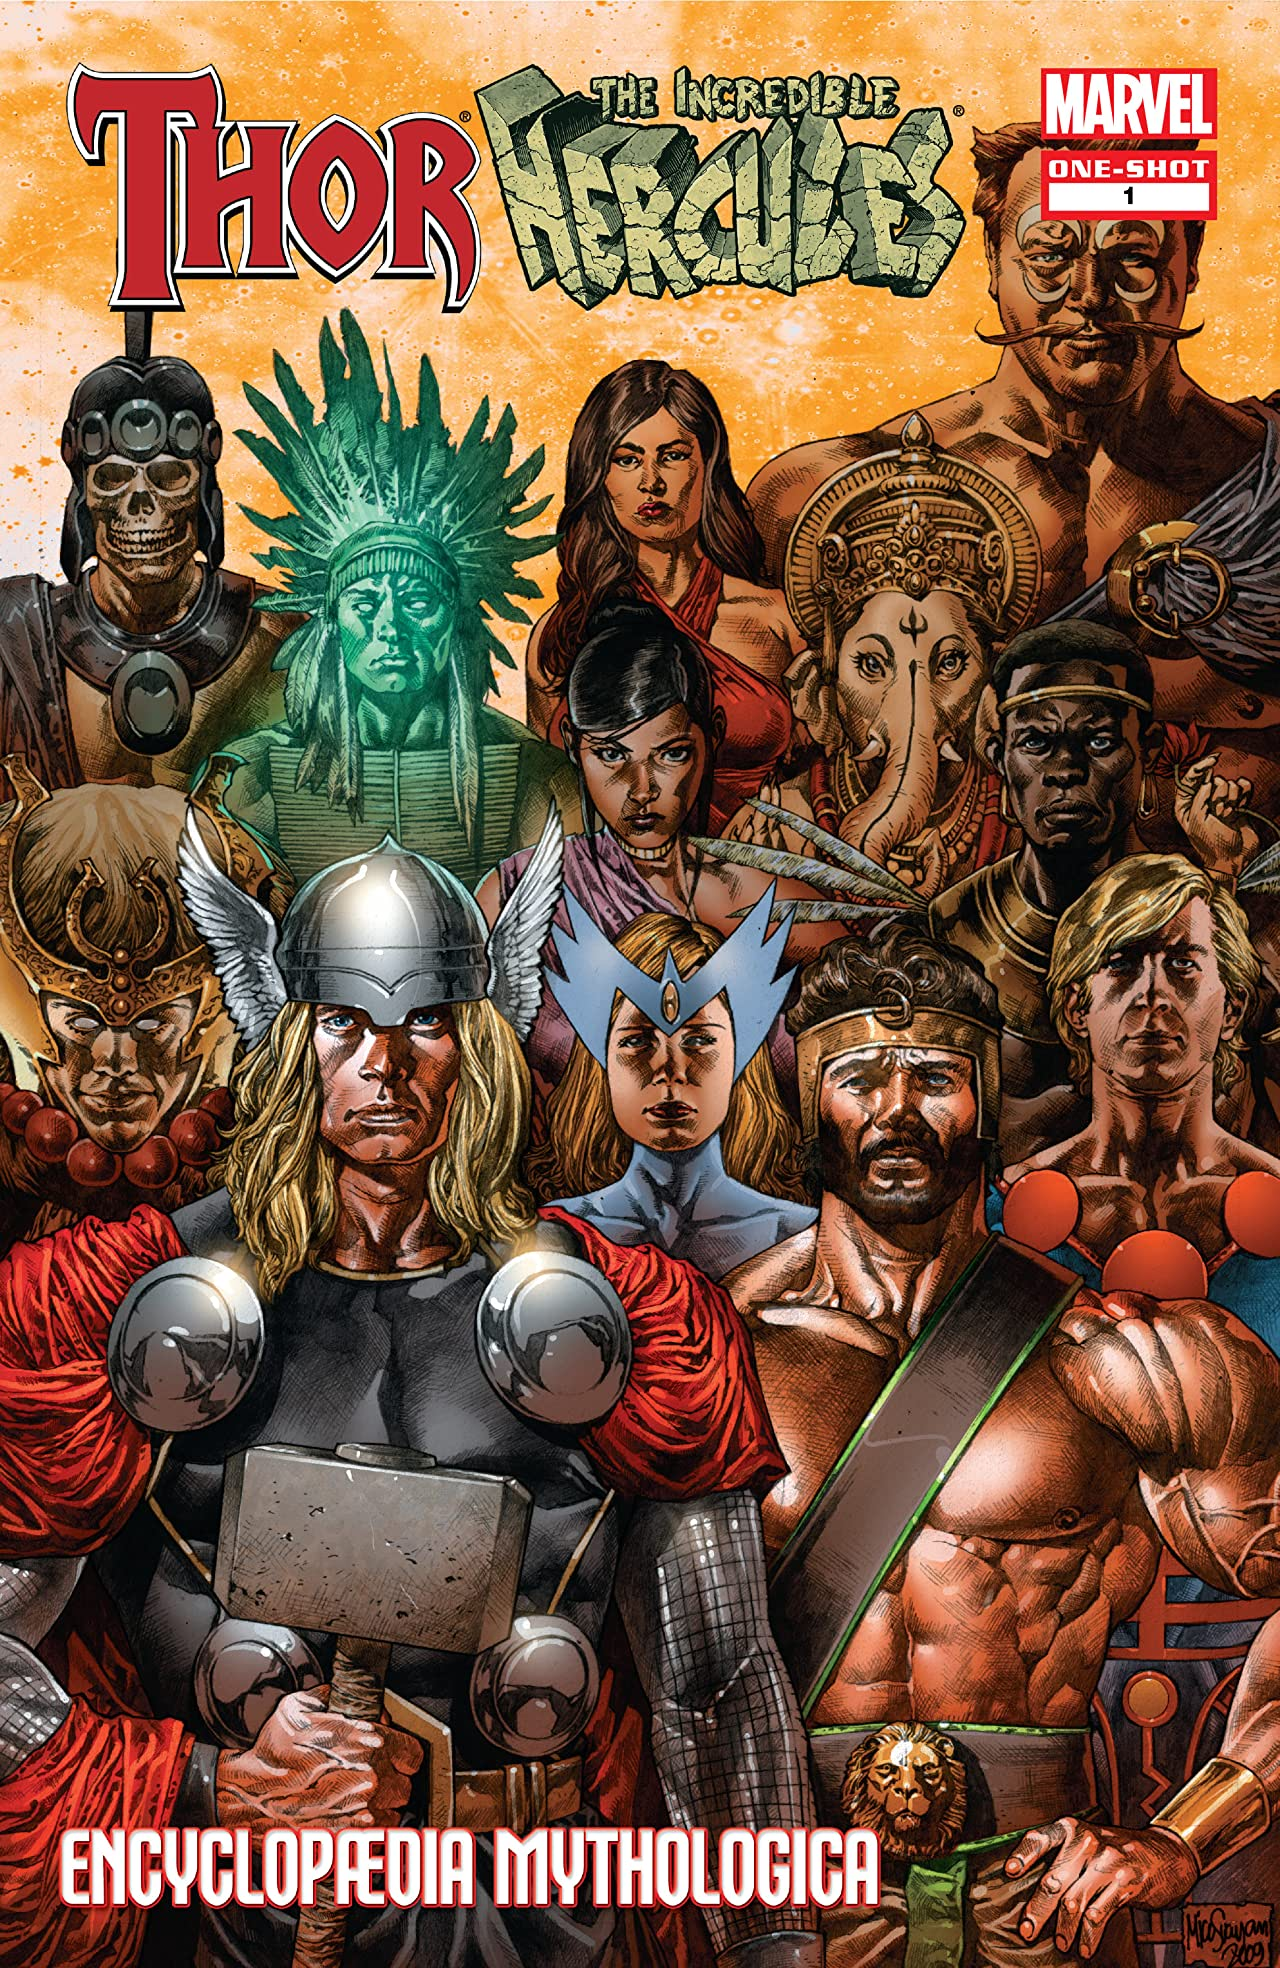 Thor & Hercules: Encyclopædia Mythologica (2009) #1